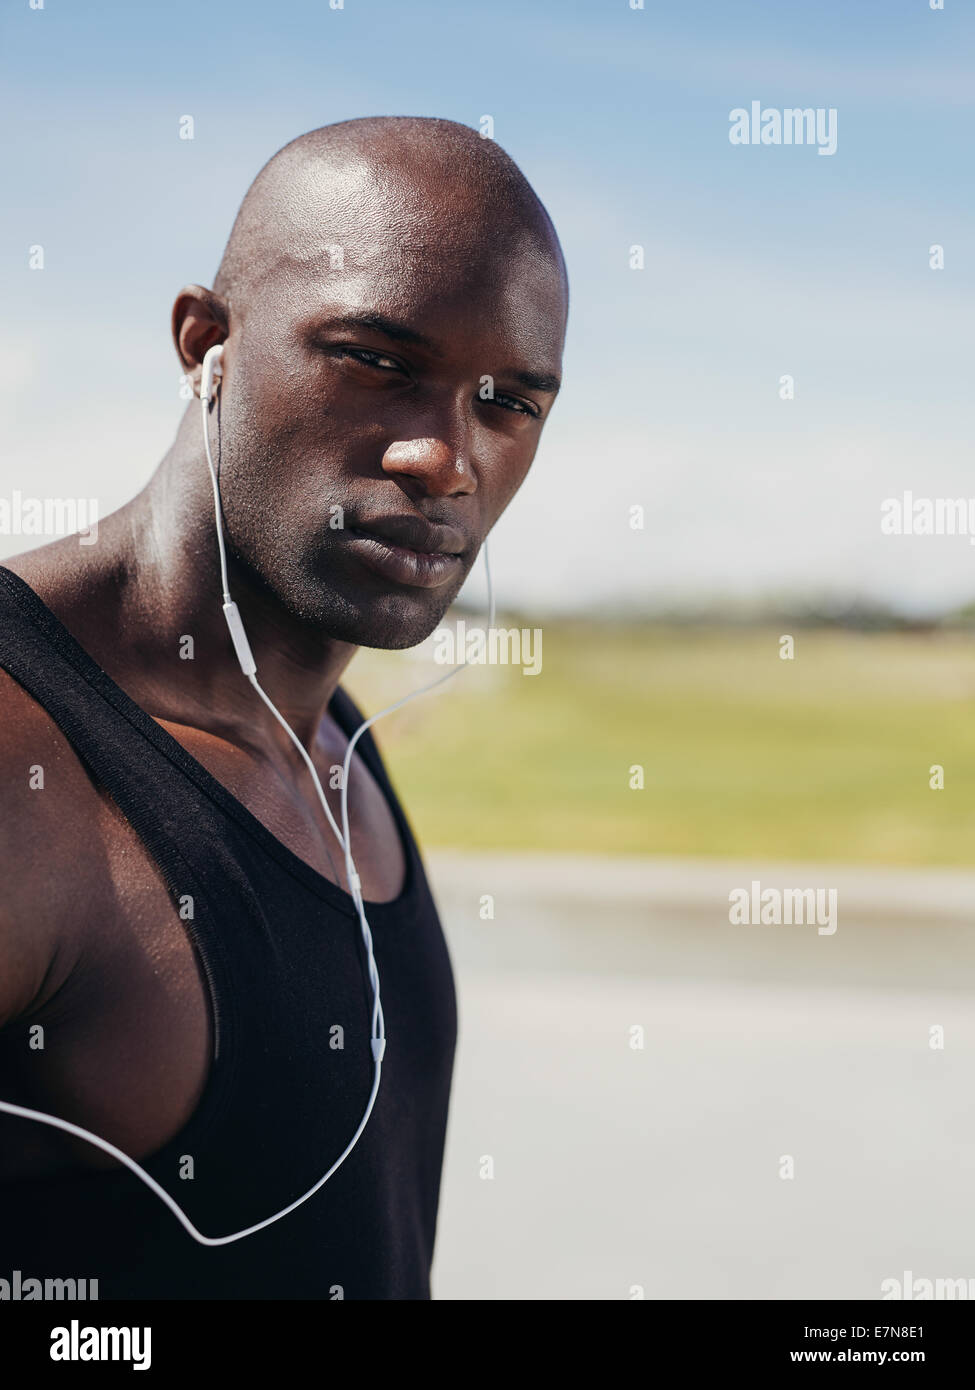 Imagen del guapo joven usando auriculares mirando a la cámara. Modelo masculino africana al aire libre. Imagen De Stock